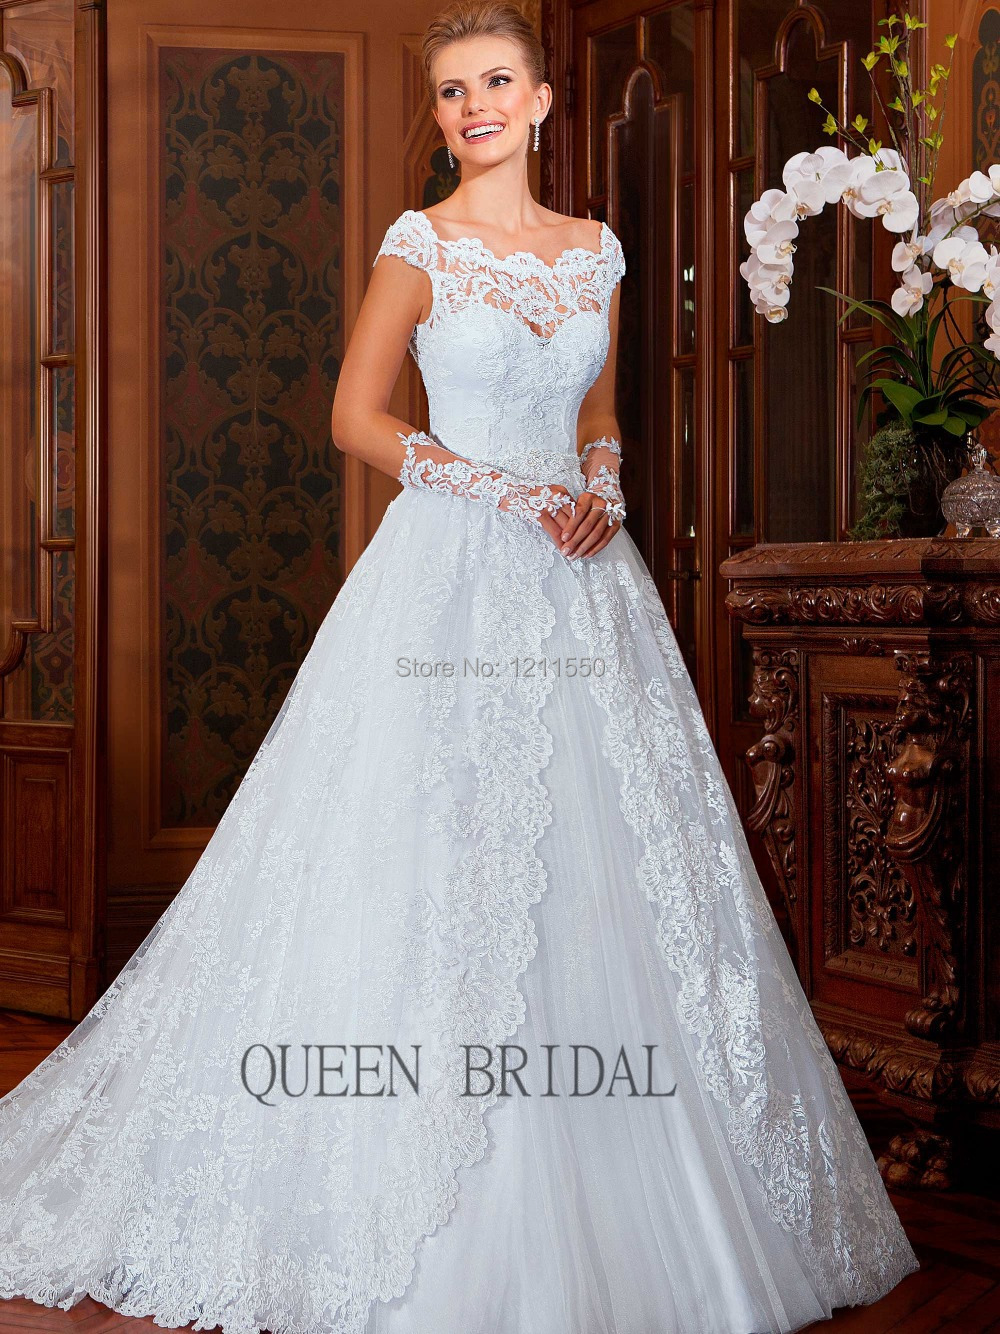 Vestido noiva 2015 nuevo romántico vestido de novia con tren de la ...